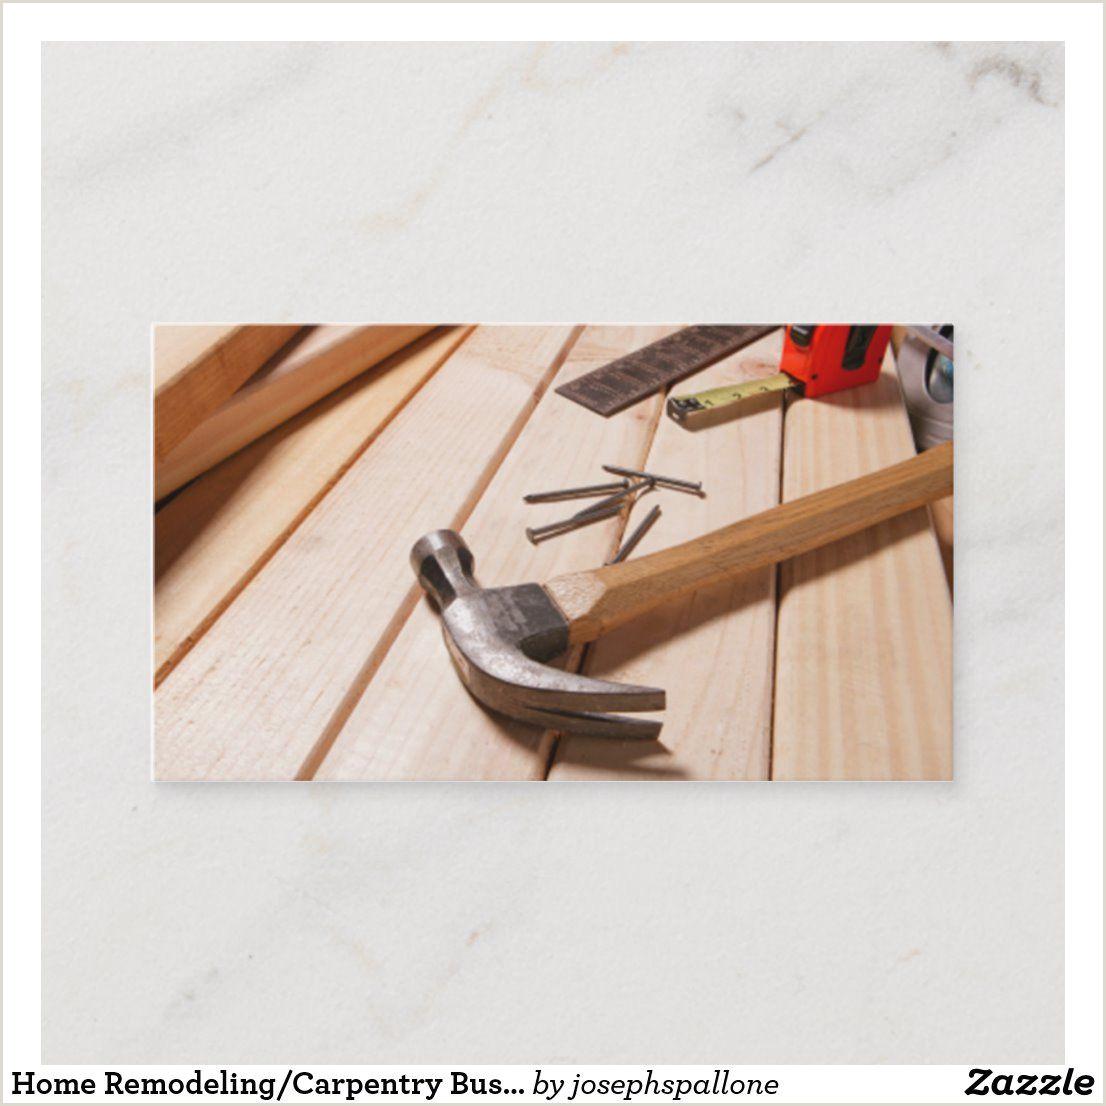 Best Business Cards For Carpenters Carpenter Business Card Templates